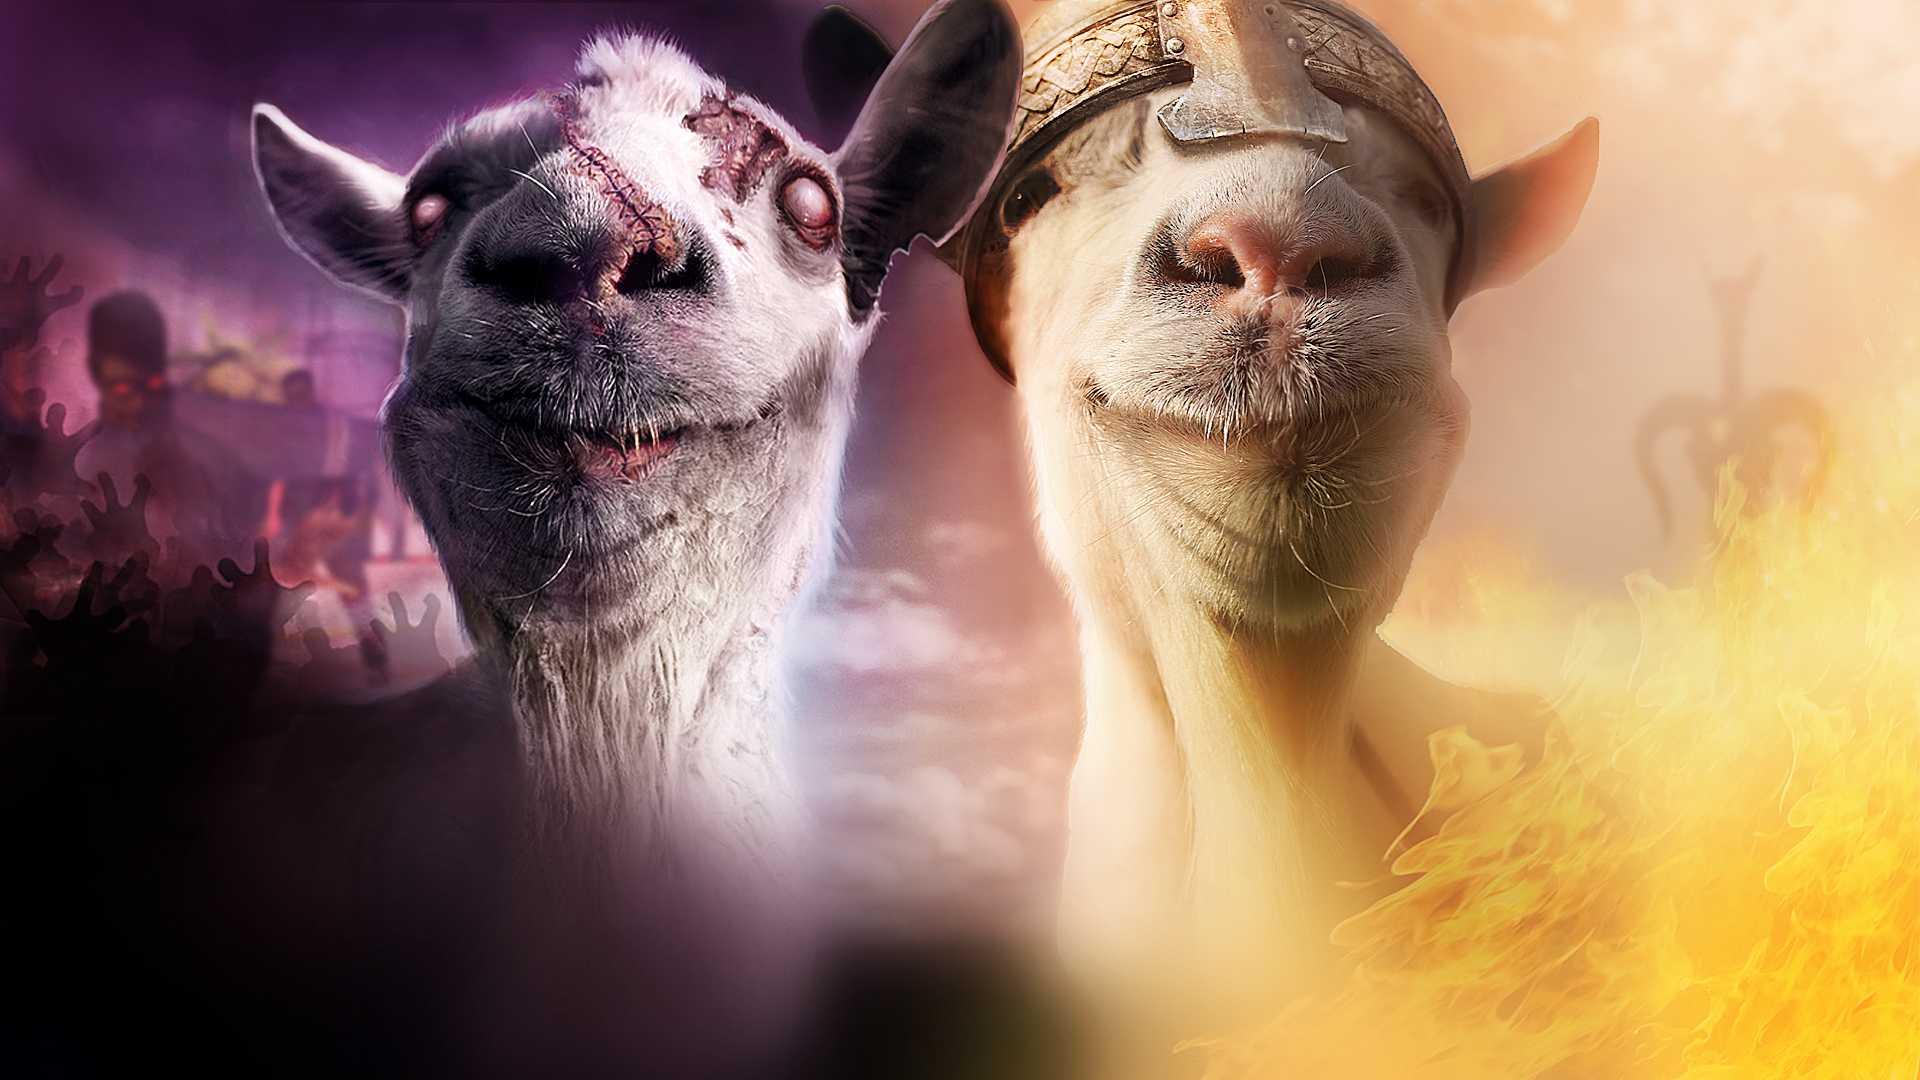 Buy Goat Simulator: Mmore Goatz Edition - Xbox Store Checker